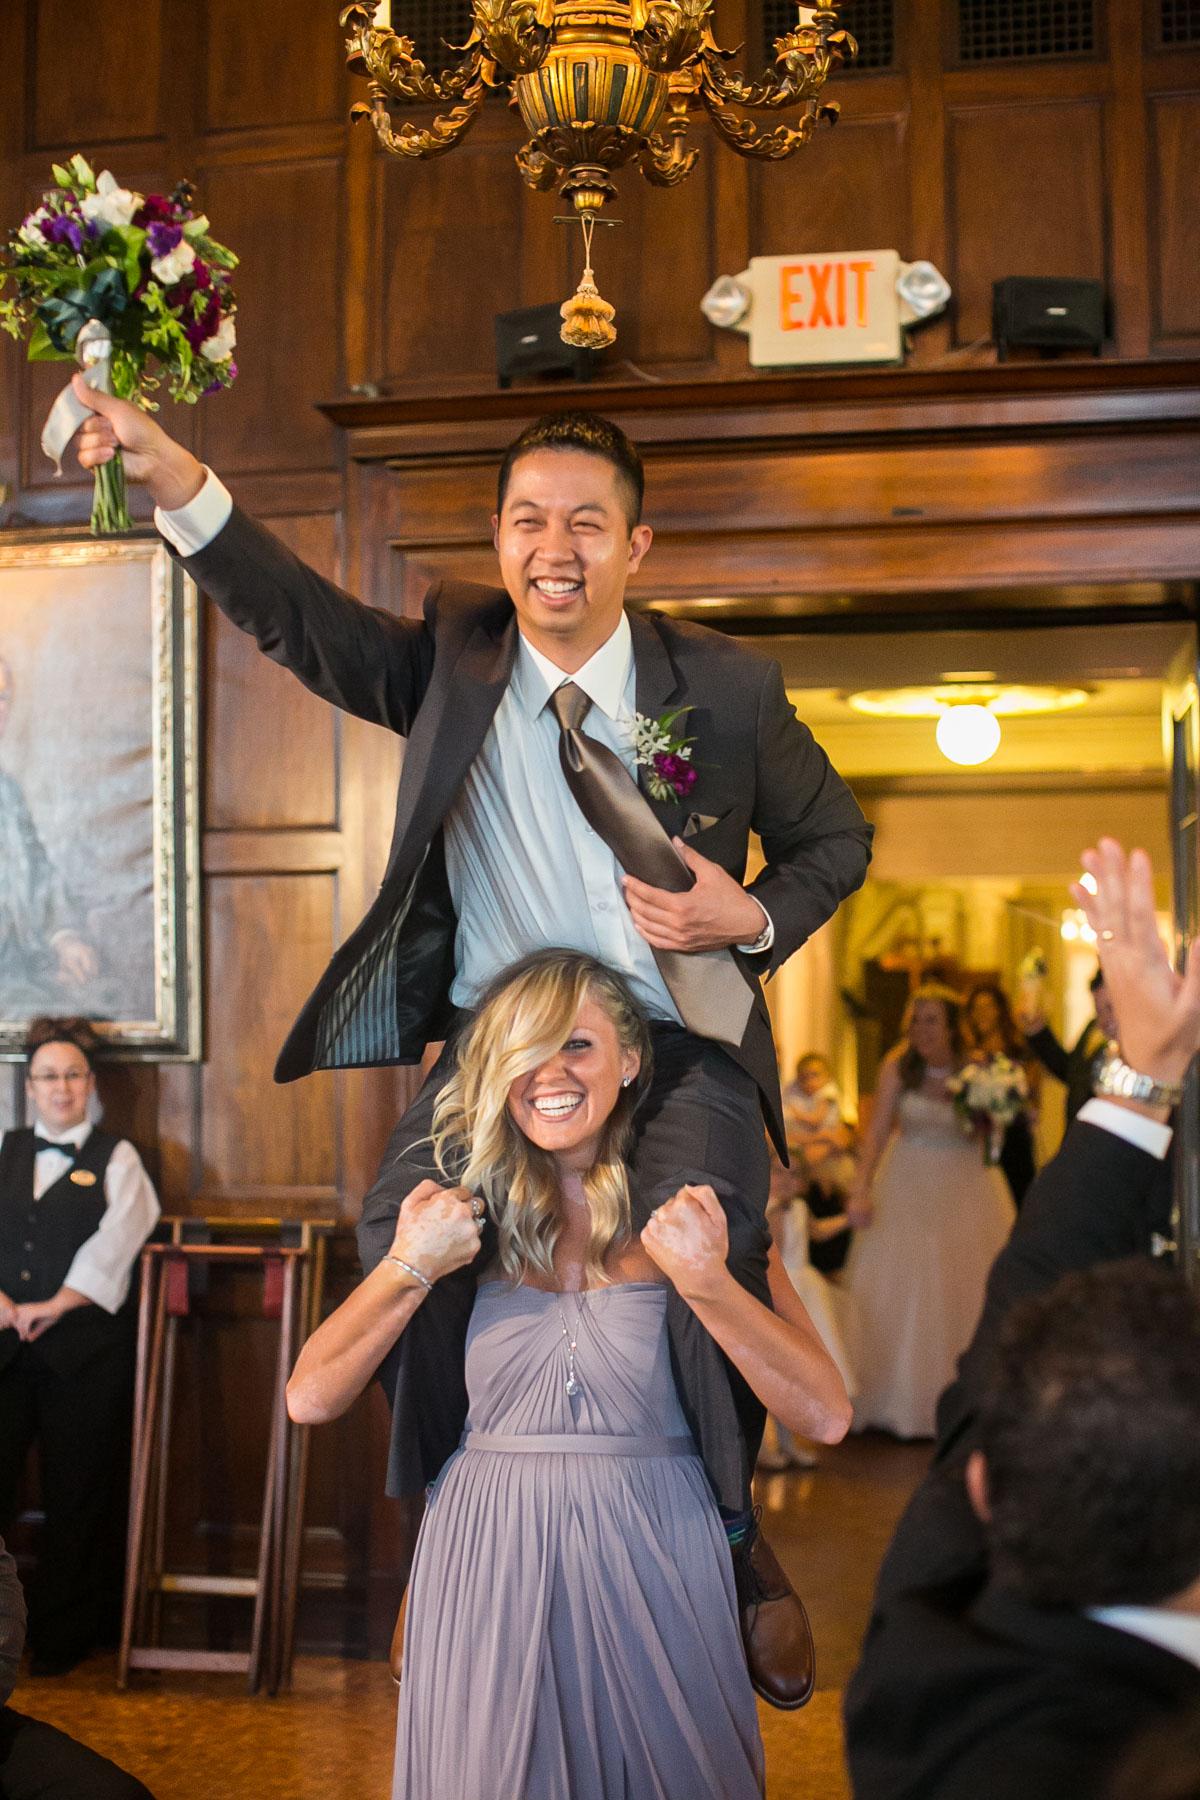 toledo-club-wedding-photos (84 of 101).jpg